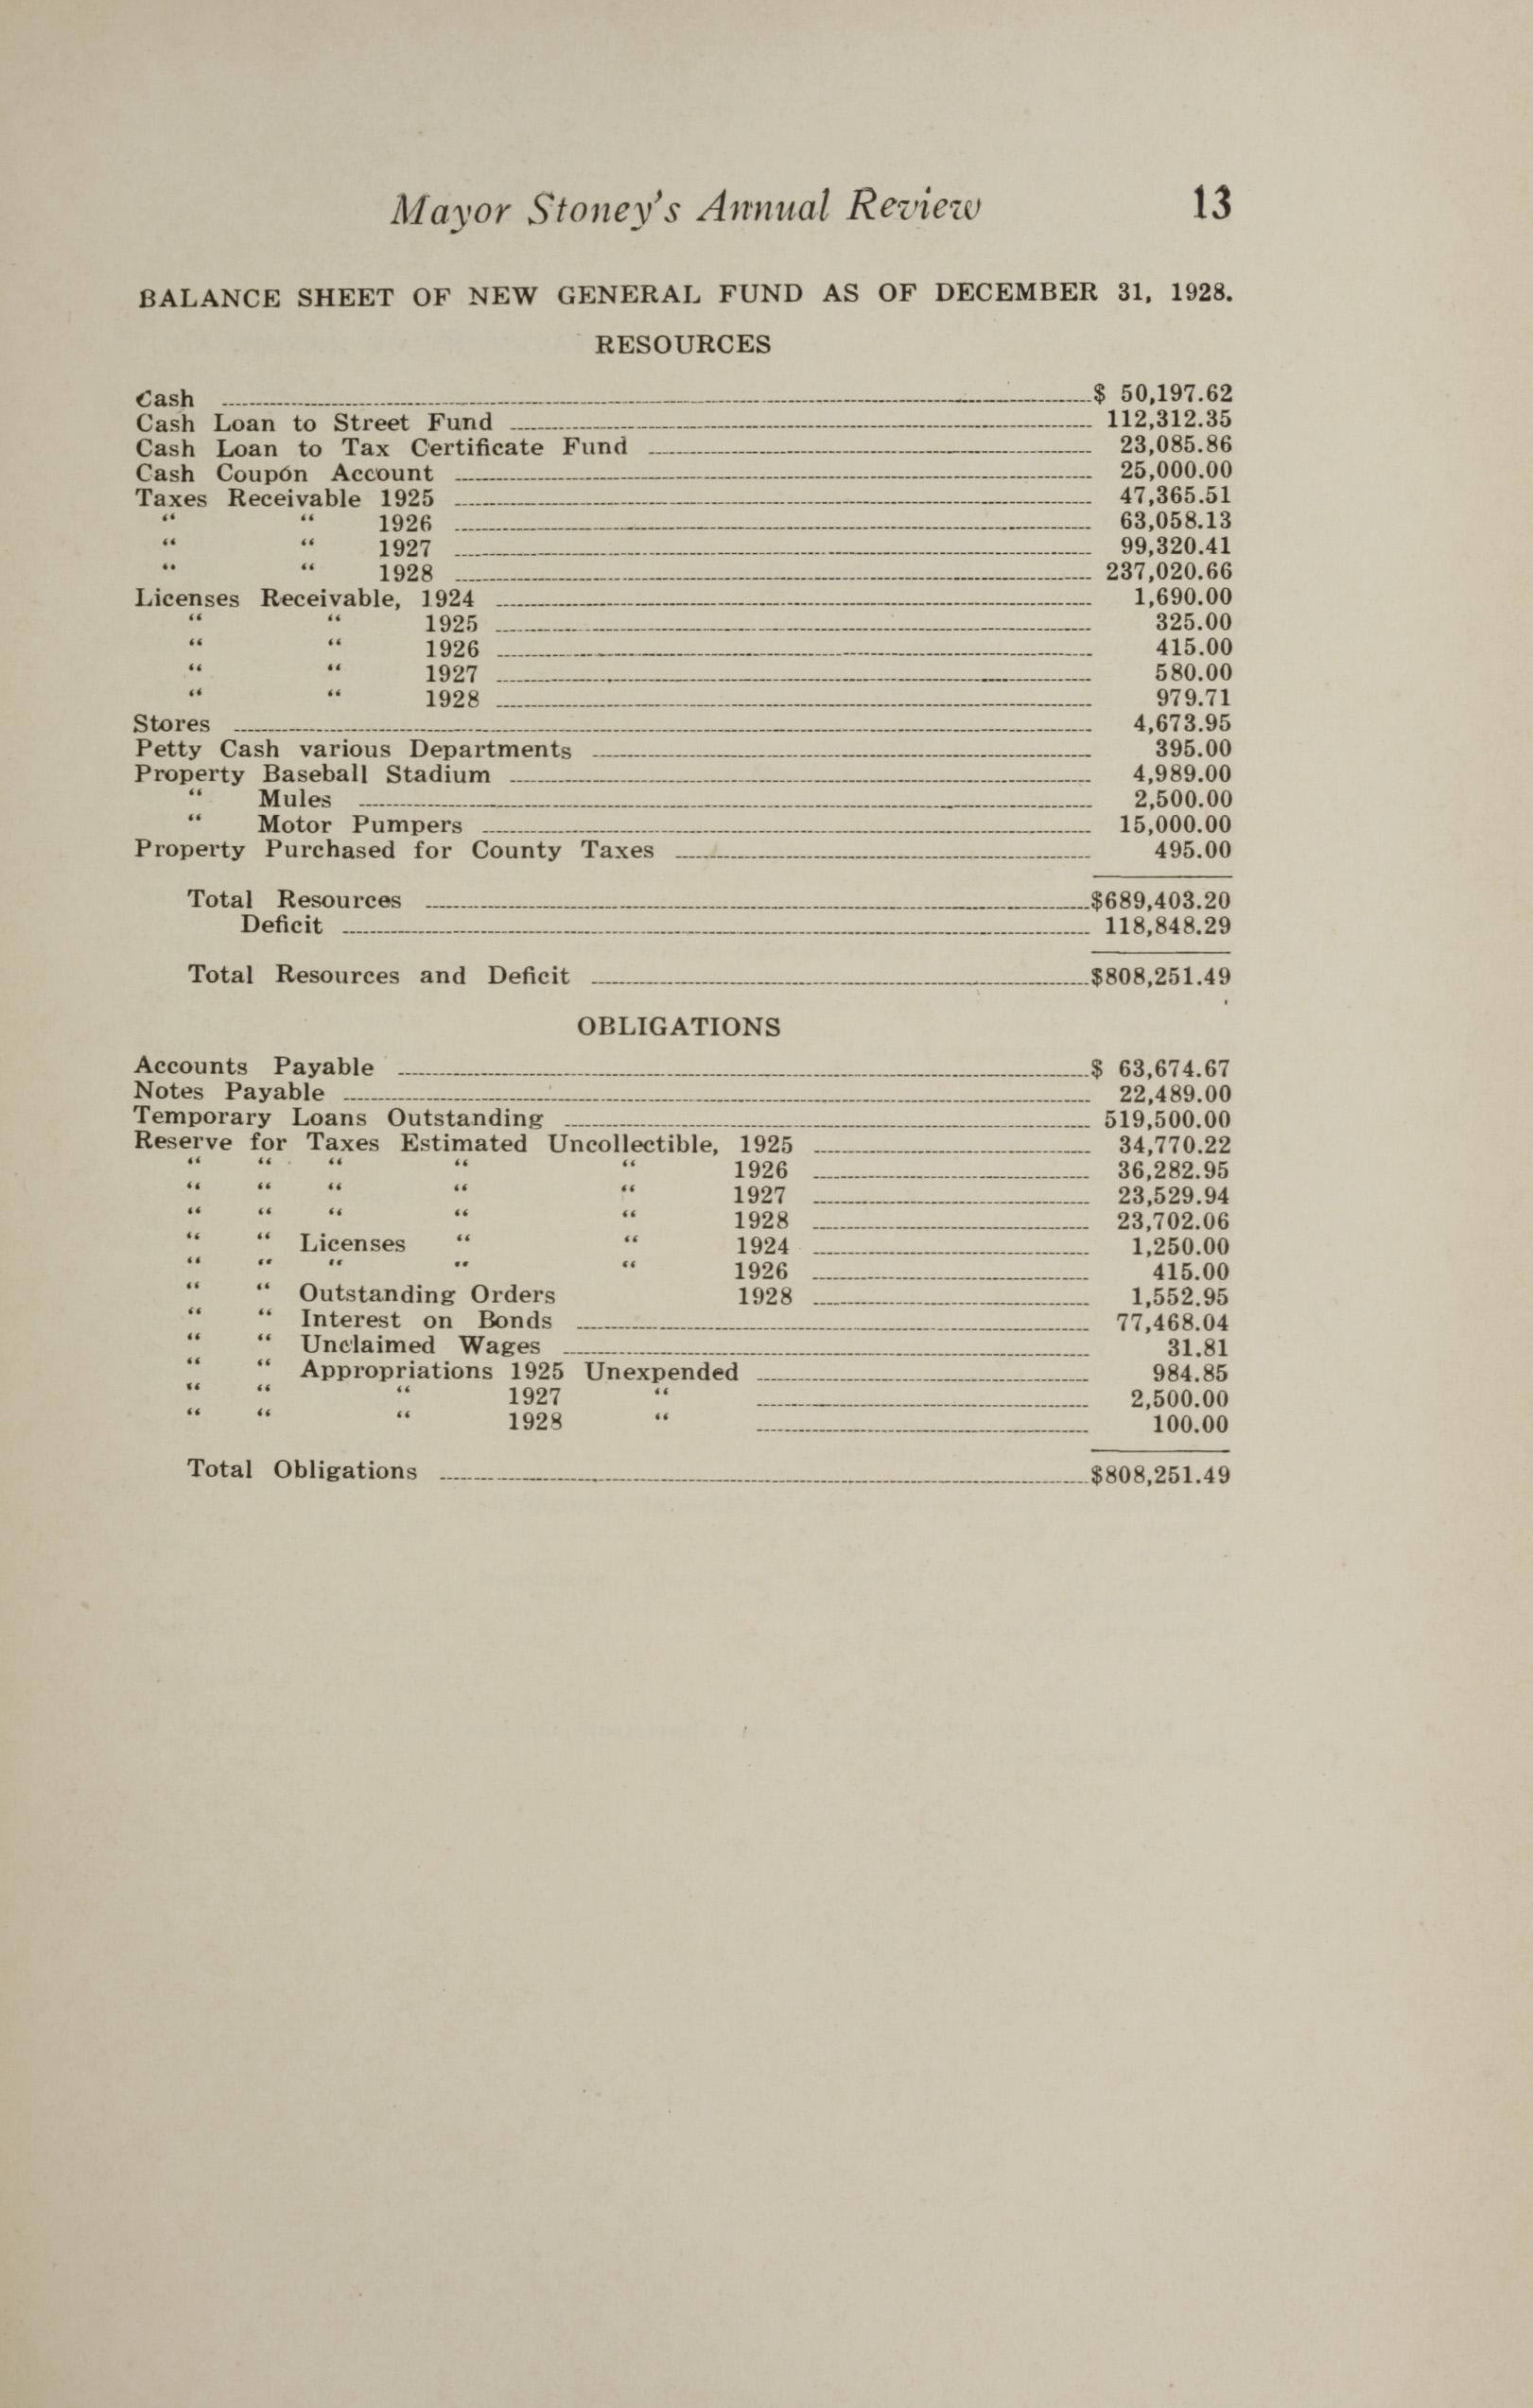 Charleston Yearbook, 1928, page 13